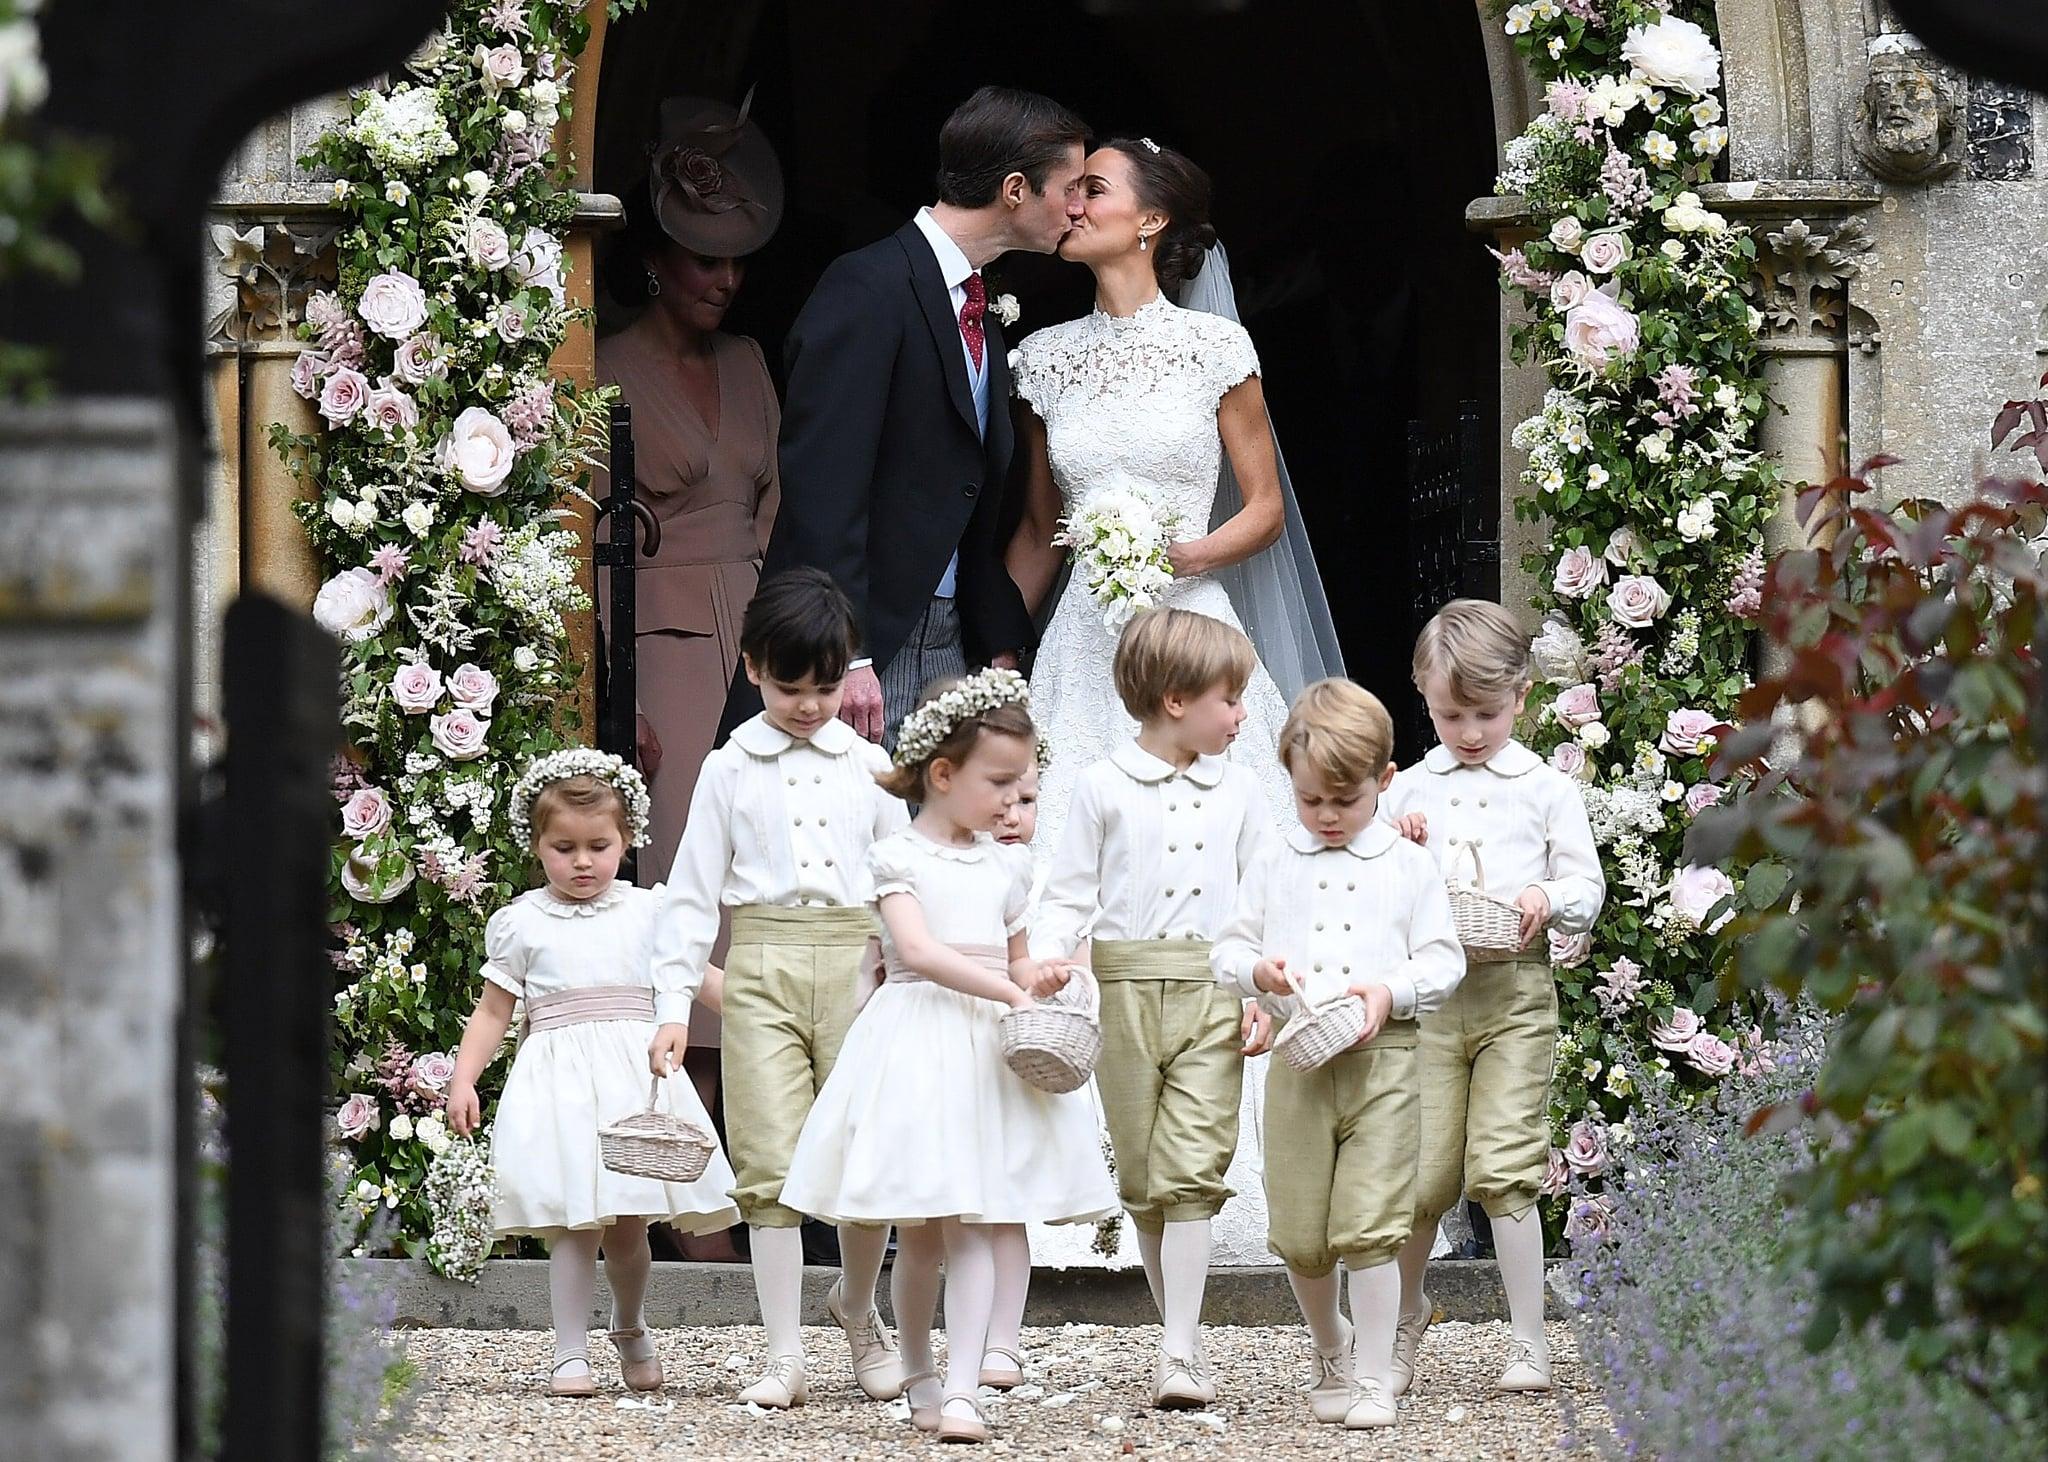 Pippa S Wedding.Who Was In Pippa Middleton S Wedding Party Popsugar Celebrity